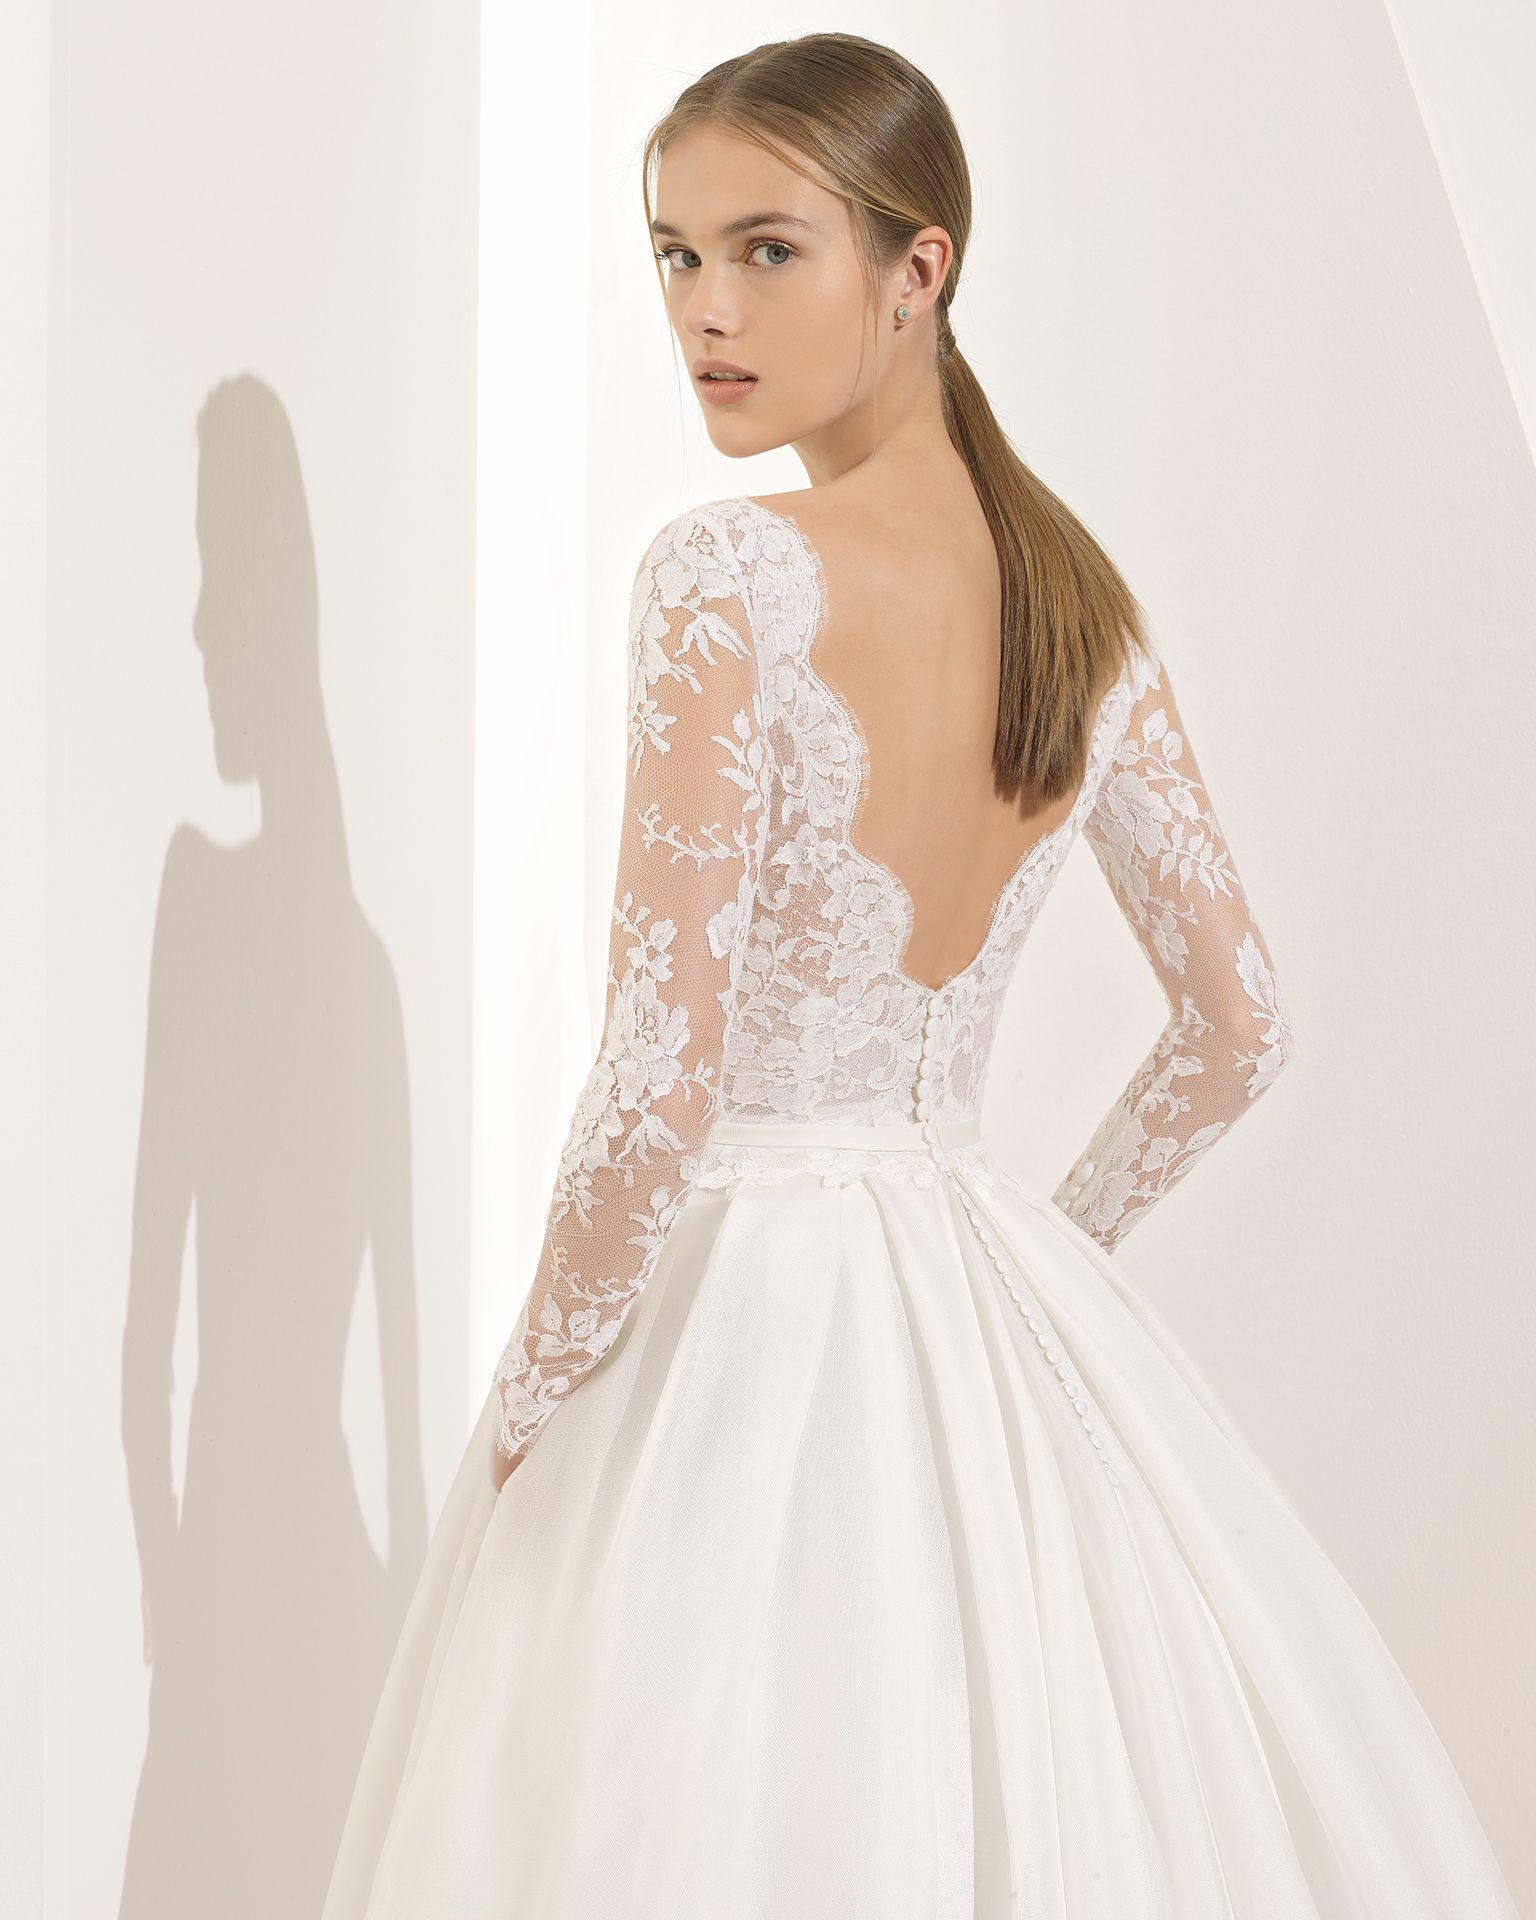 PARODIA - Hochzeit 2018. Kollektion Rosa Clará Couture | Bateau ...